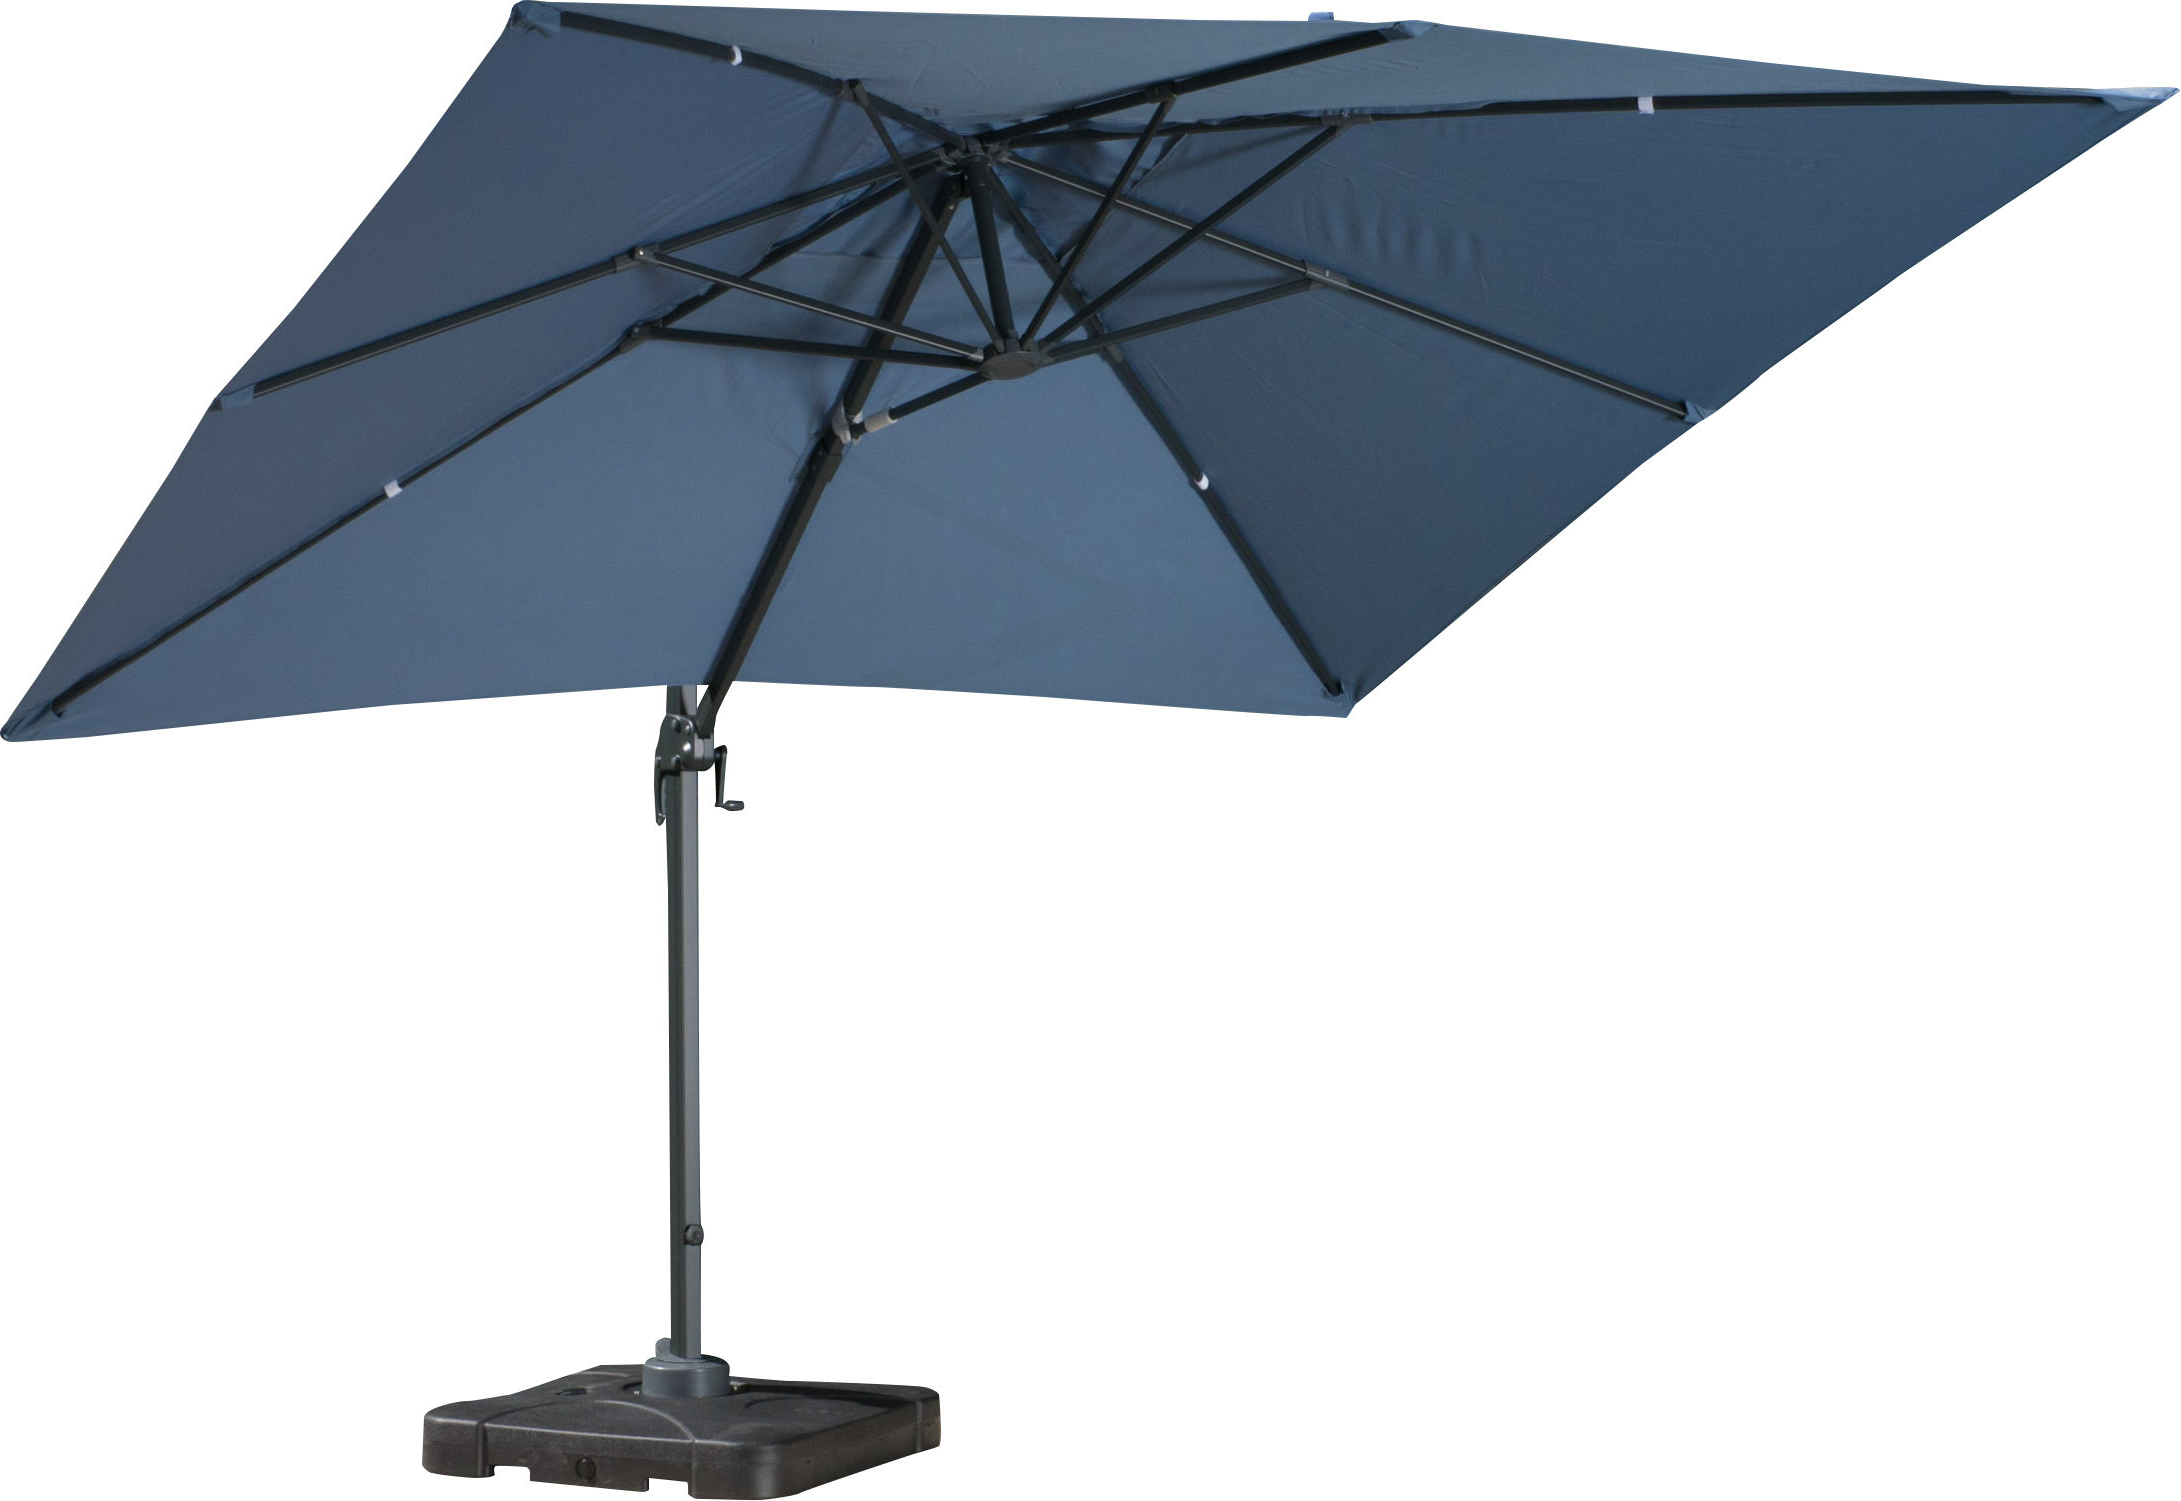 Sol 72 Outdoor Boracay 10' Square Cantilever Umbrella Regarding Well Known Krystal Square Cantilever Sunbrella Umbrellas (View 14 of 20)